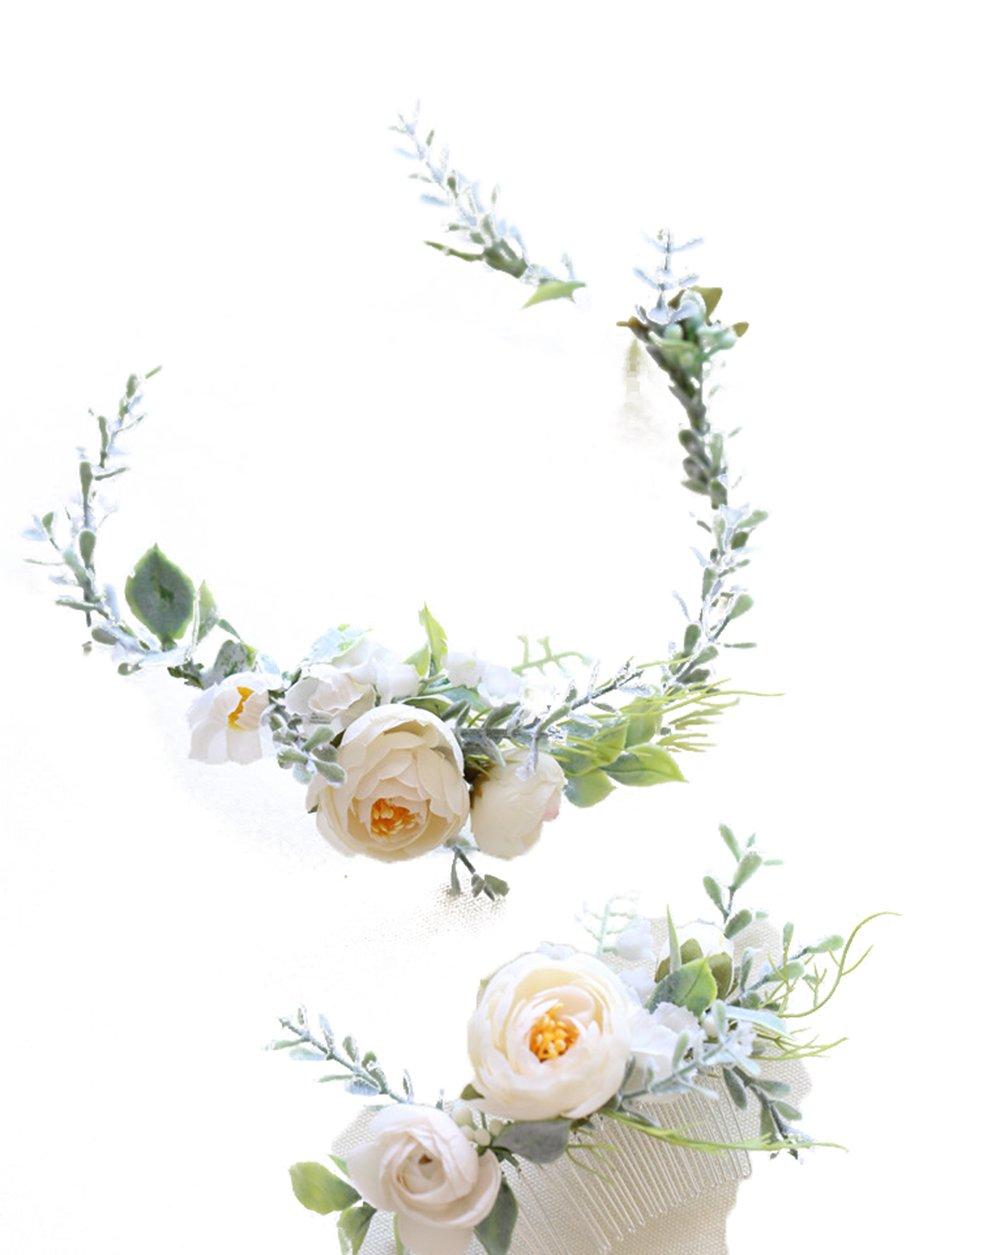 FIDDY898 Floral Crown Green Vine Bridal Accessories Wedding Crown (Set) by FIDDY898